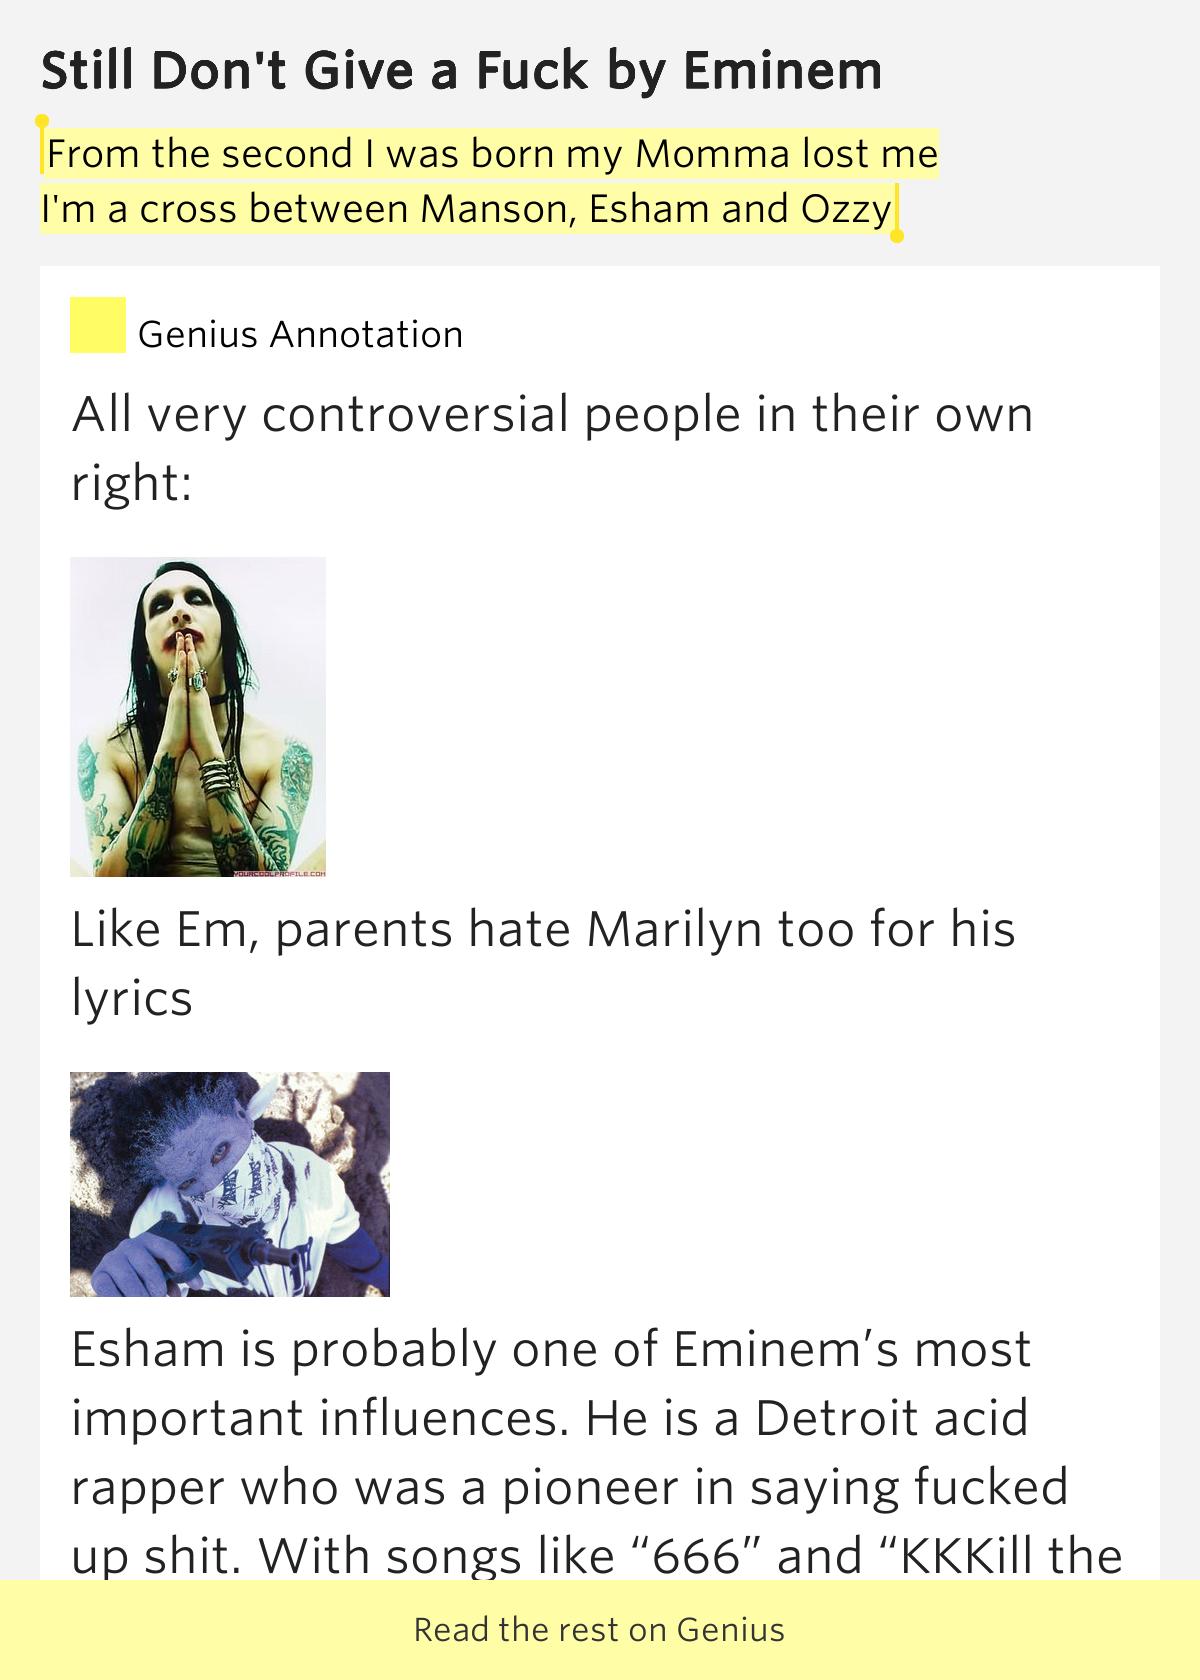 eminem still don t give a fuck